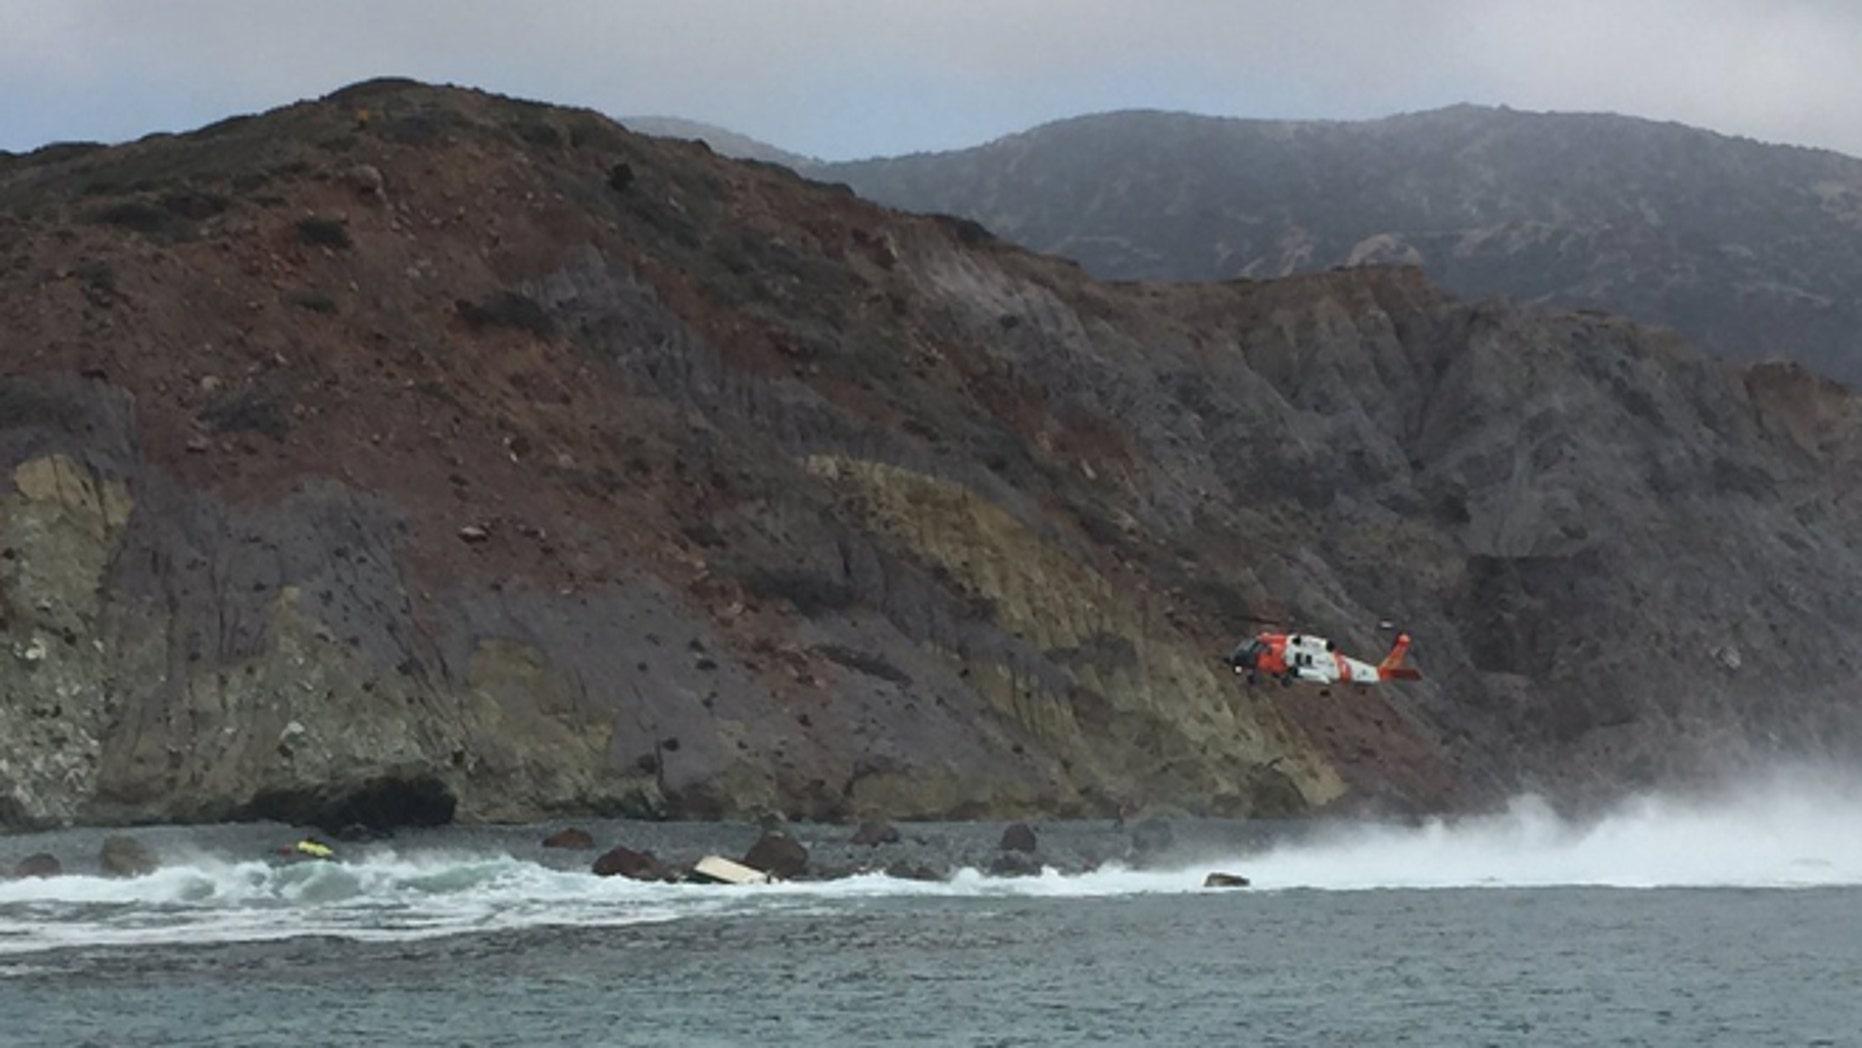 Credit: Los Angeles County Lifeguards via FoxLA